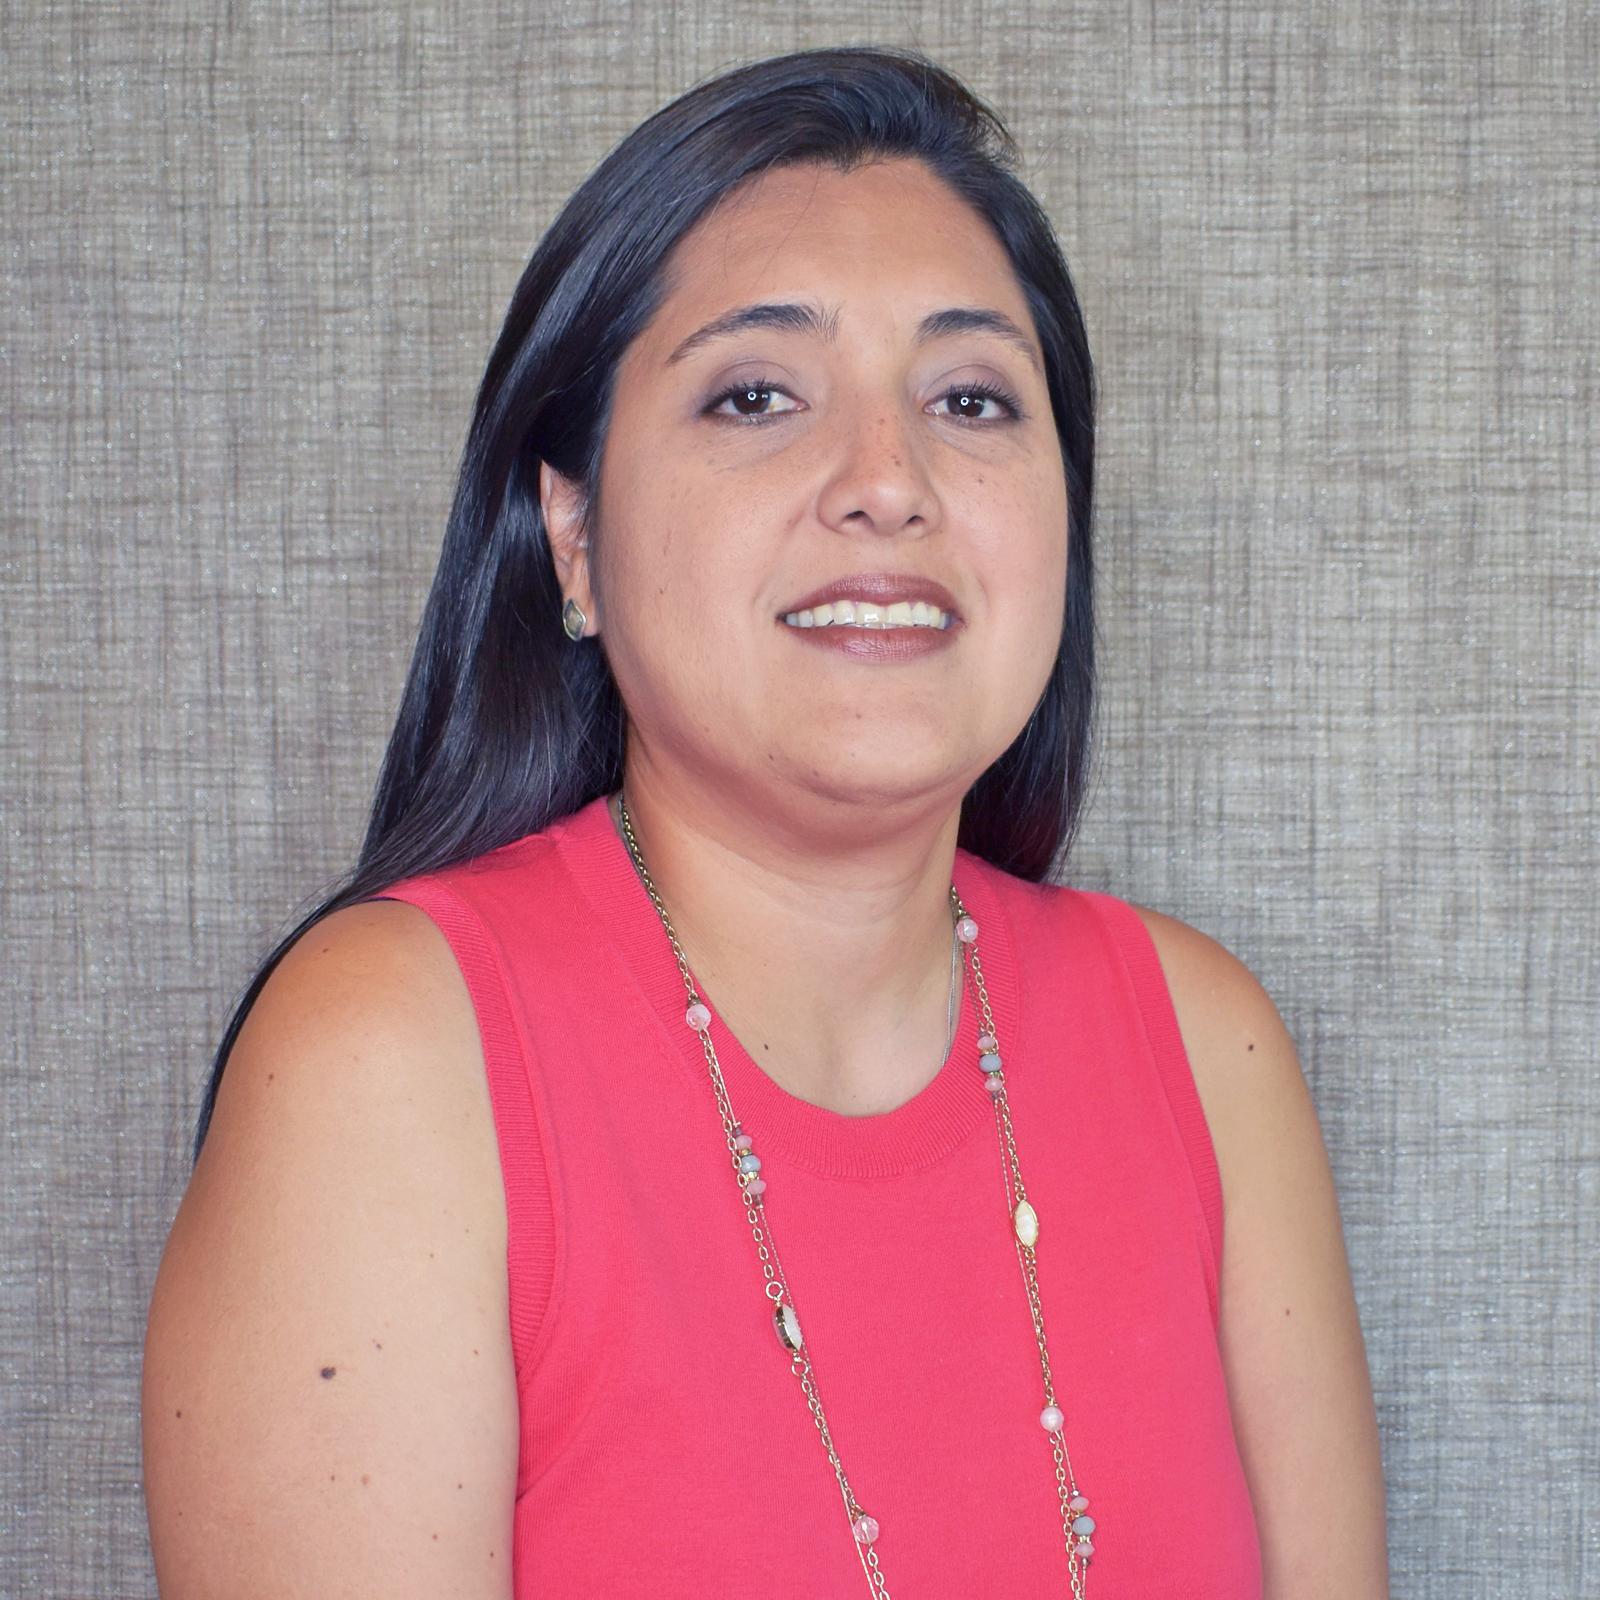 Karla Posada